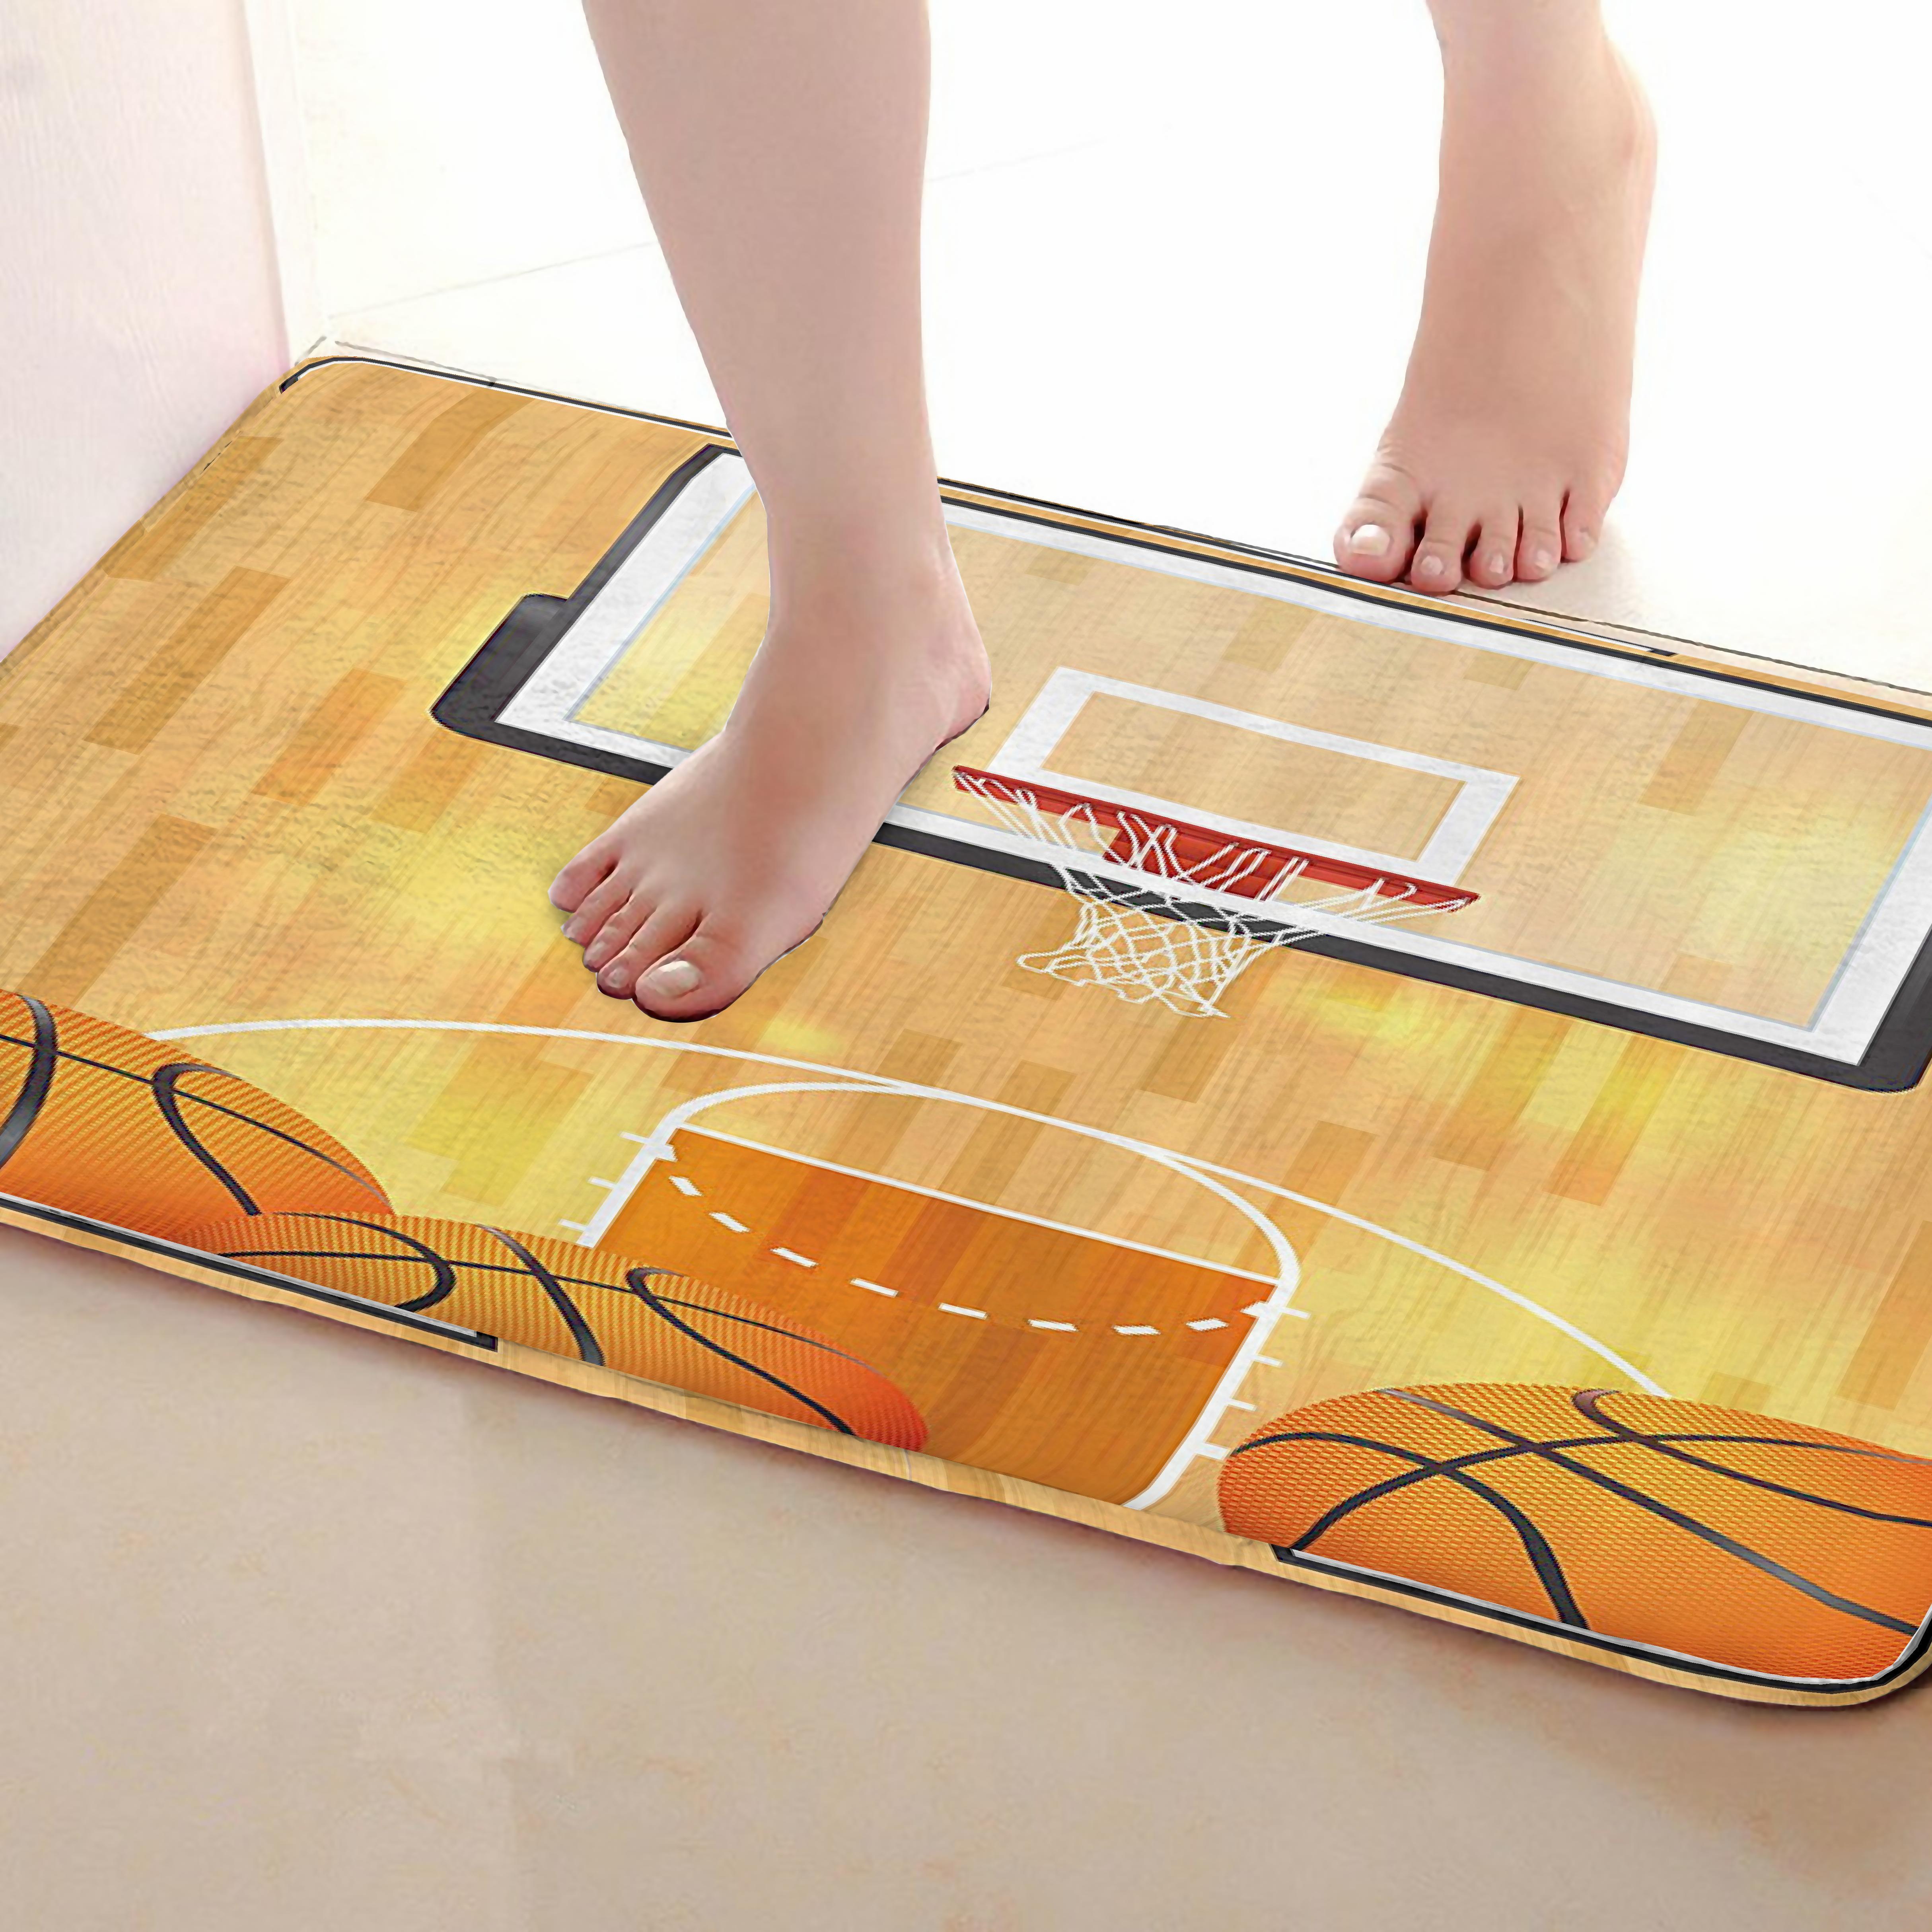 Basketball Rug Target: Basketball Court Style Bathroom Mat,Funny Anti Skid Bath